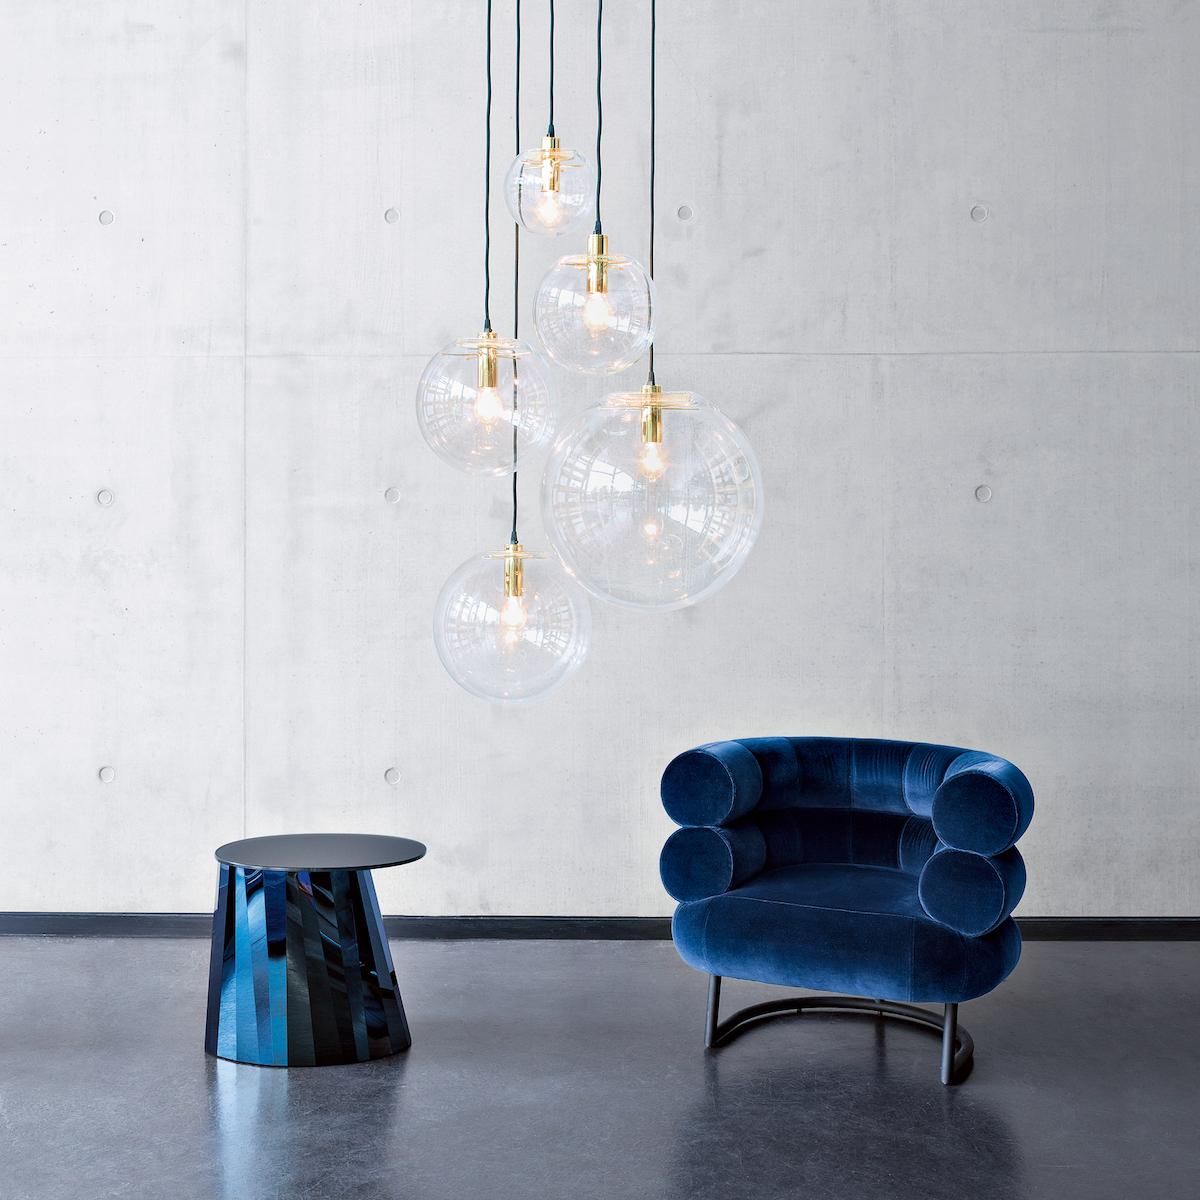 Pli Side Table, Selene Leuchte und Bibendum Sessel von Classicon © Foto Elias Hassos